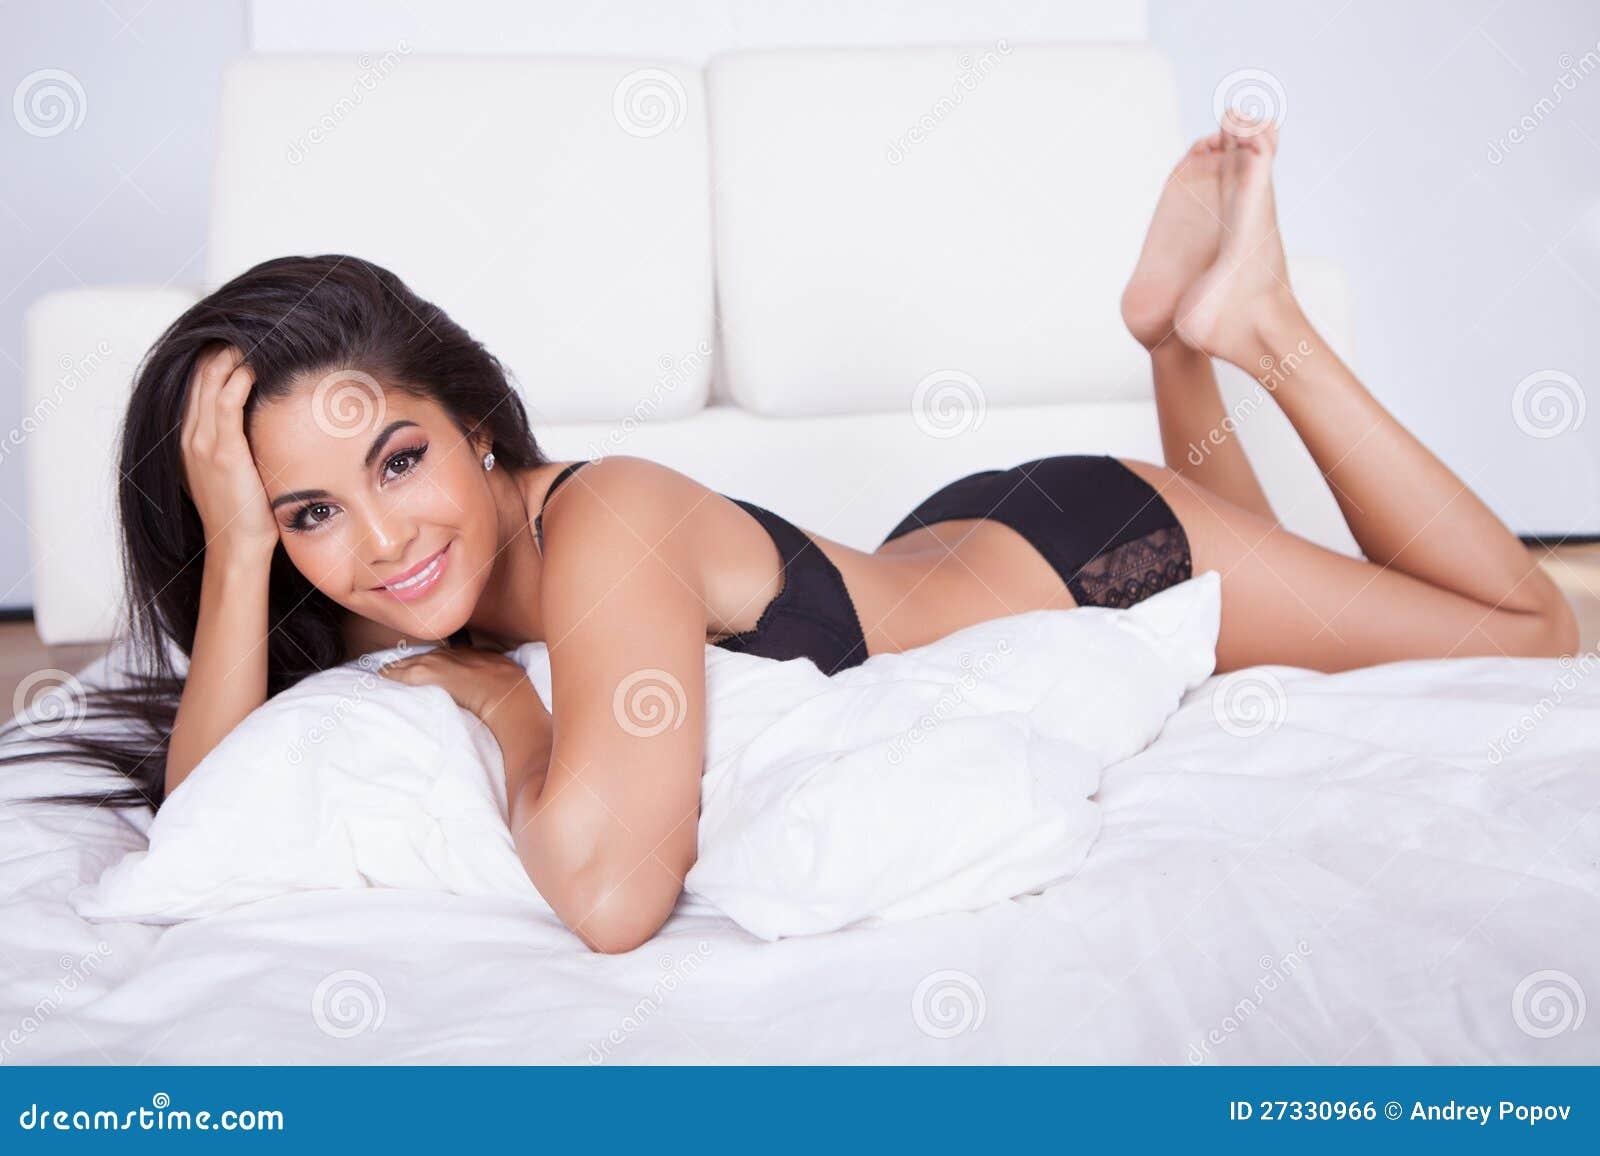 escort girl cuba tuttar bilder